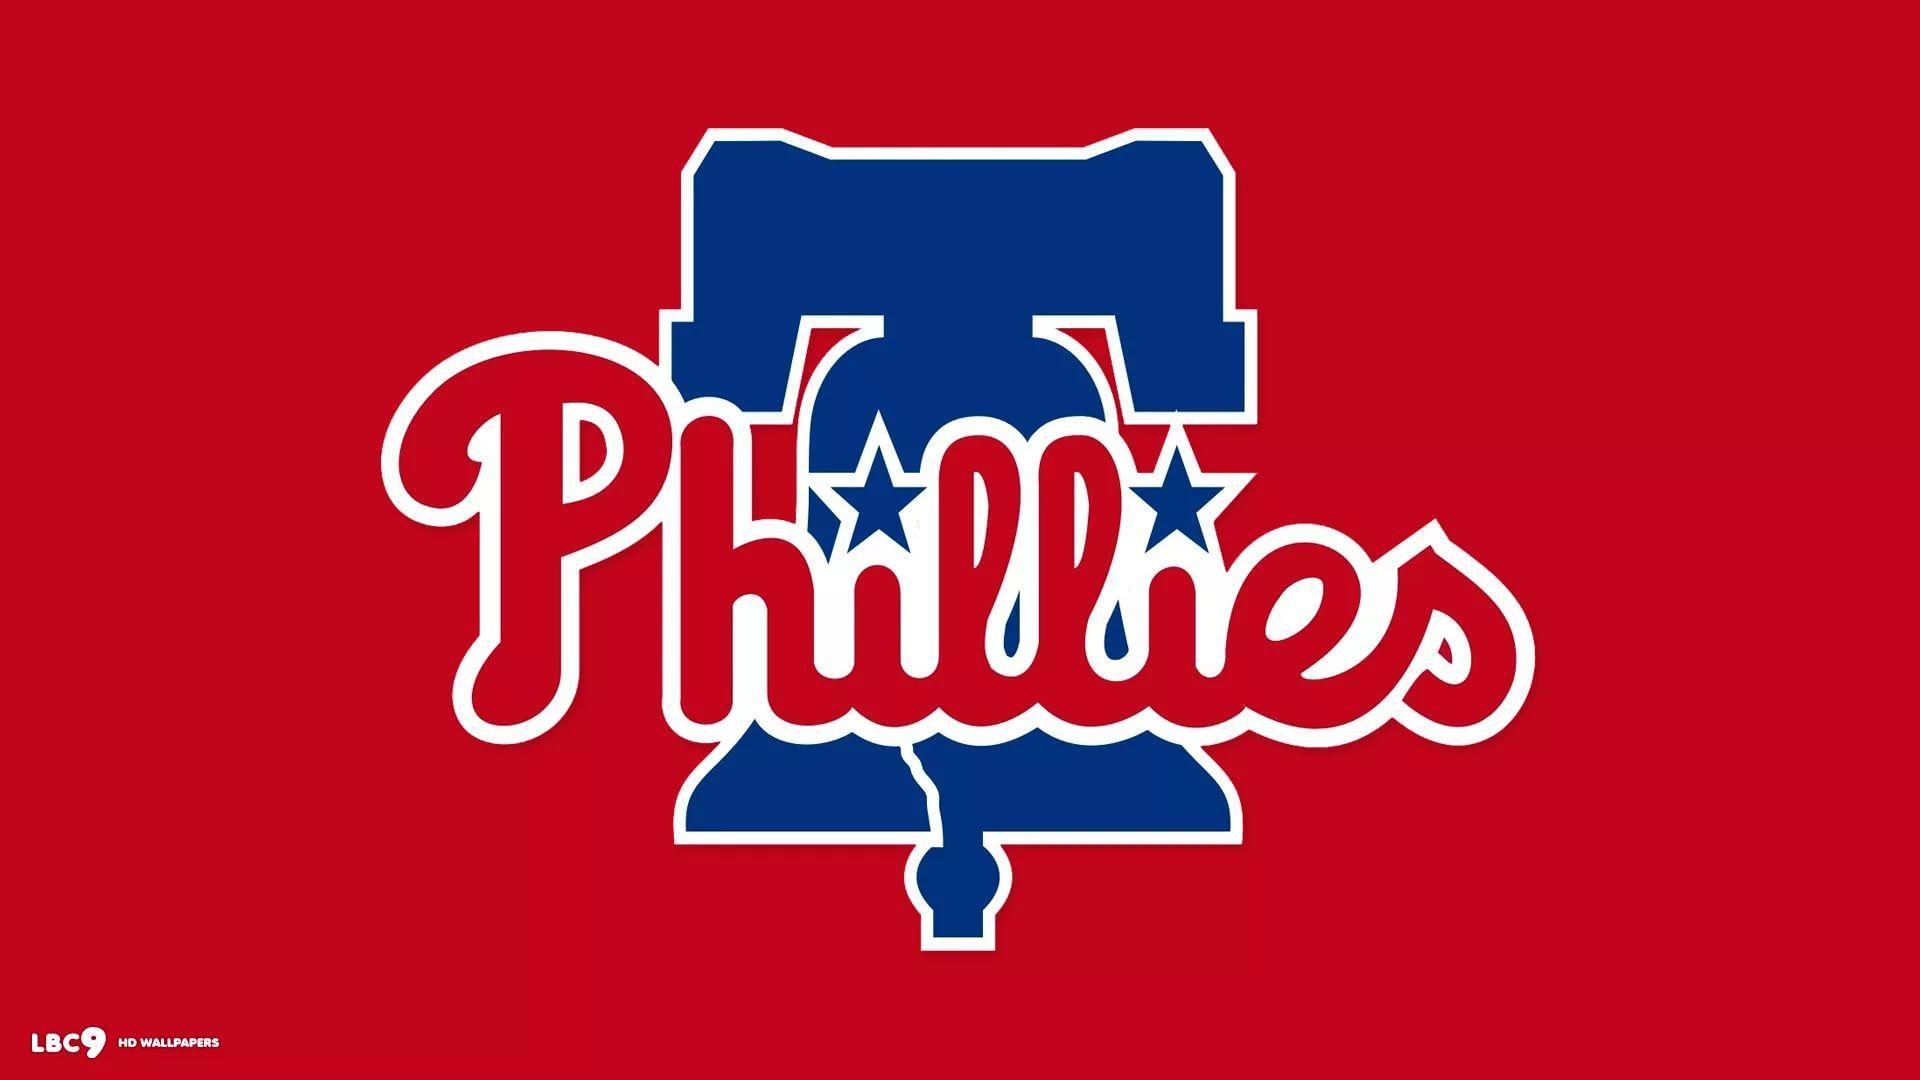 Phillies Logo full screen hd wallpaper